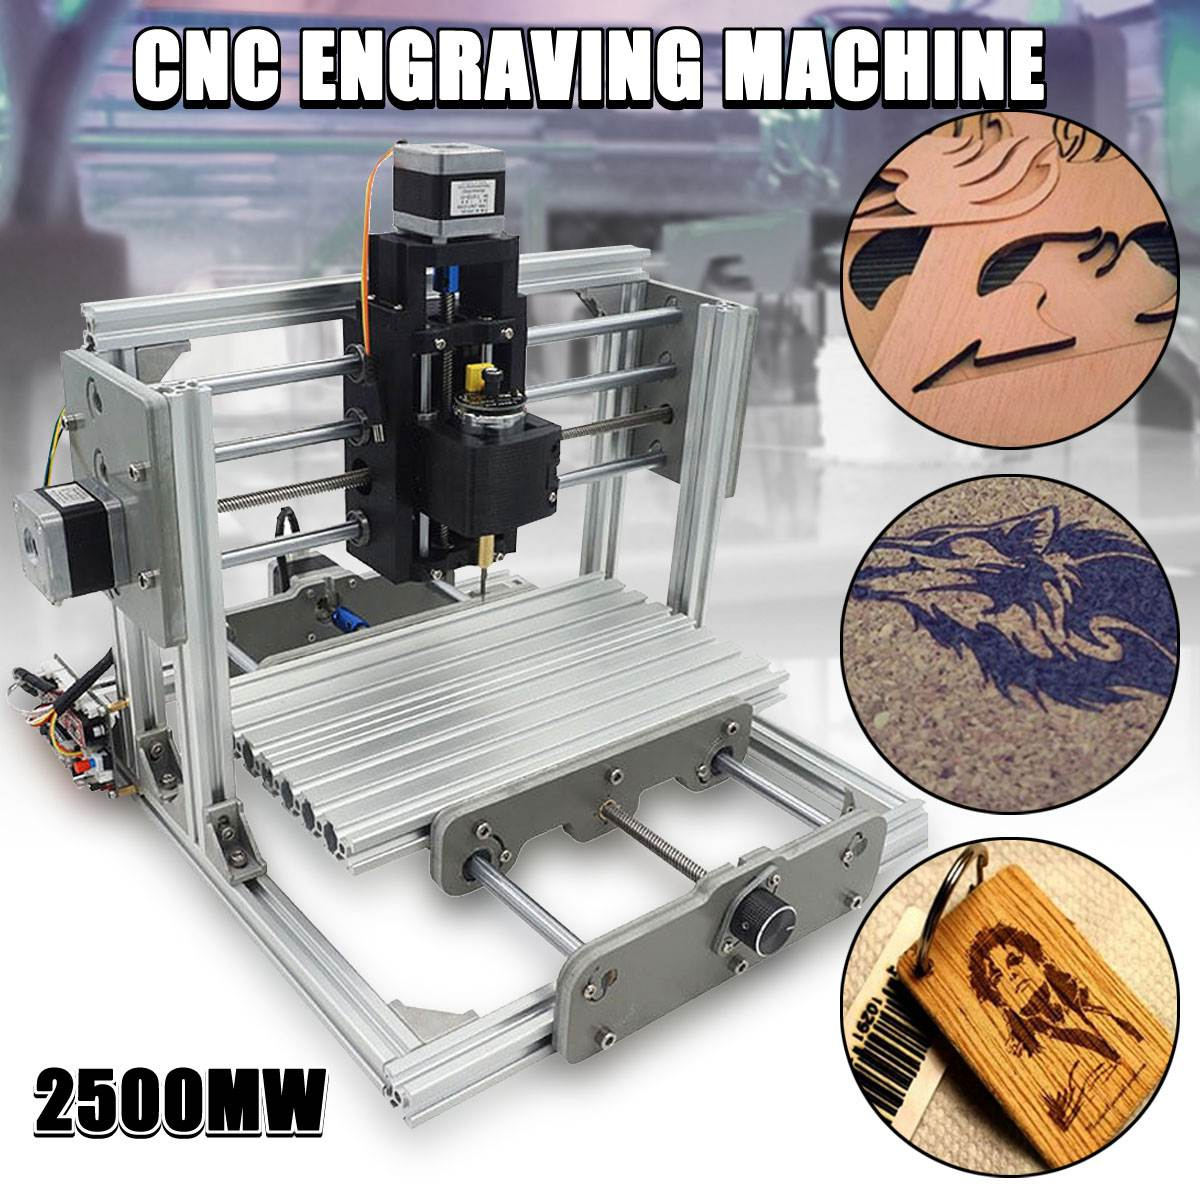 Mquina De Corte Plasma Cortador Piloto Arc Wiring Cnc Diagram Controller 4060z Dc 12v 2500mw 3 Axis Mini Diy Desktop Laser Engraver Engraving Machine Milling Carving Cutter